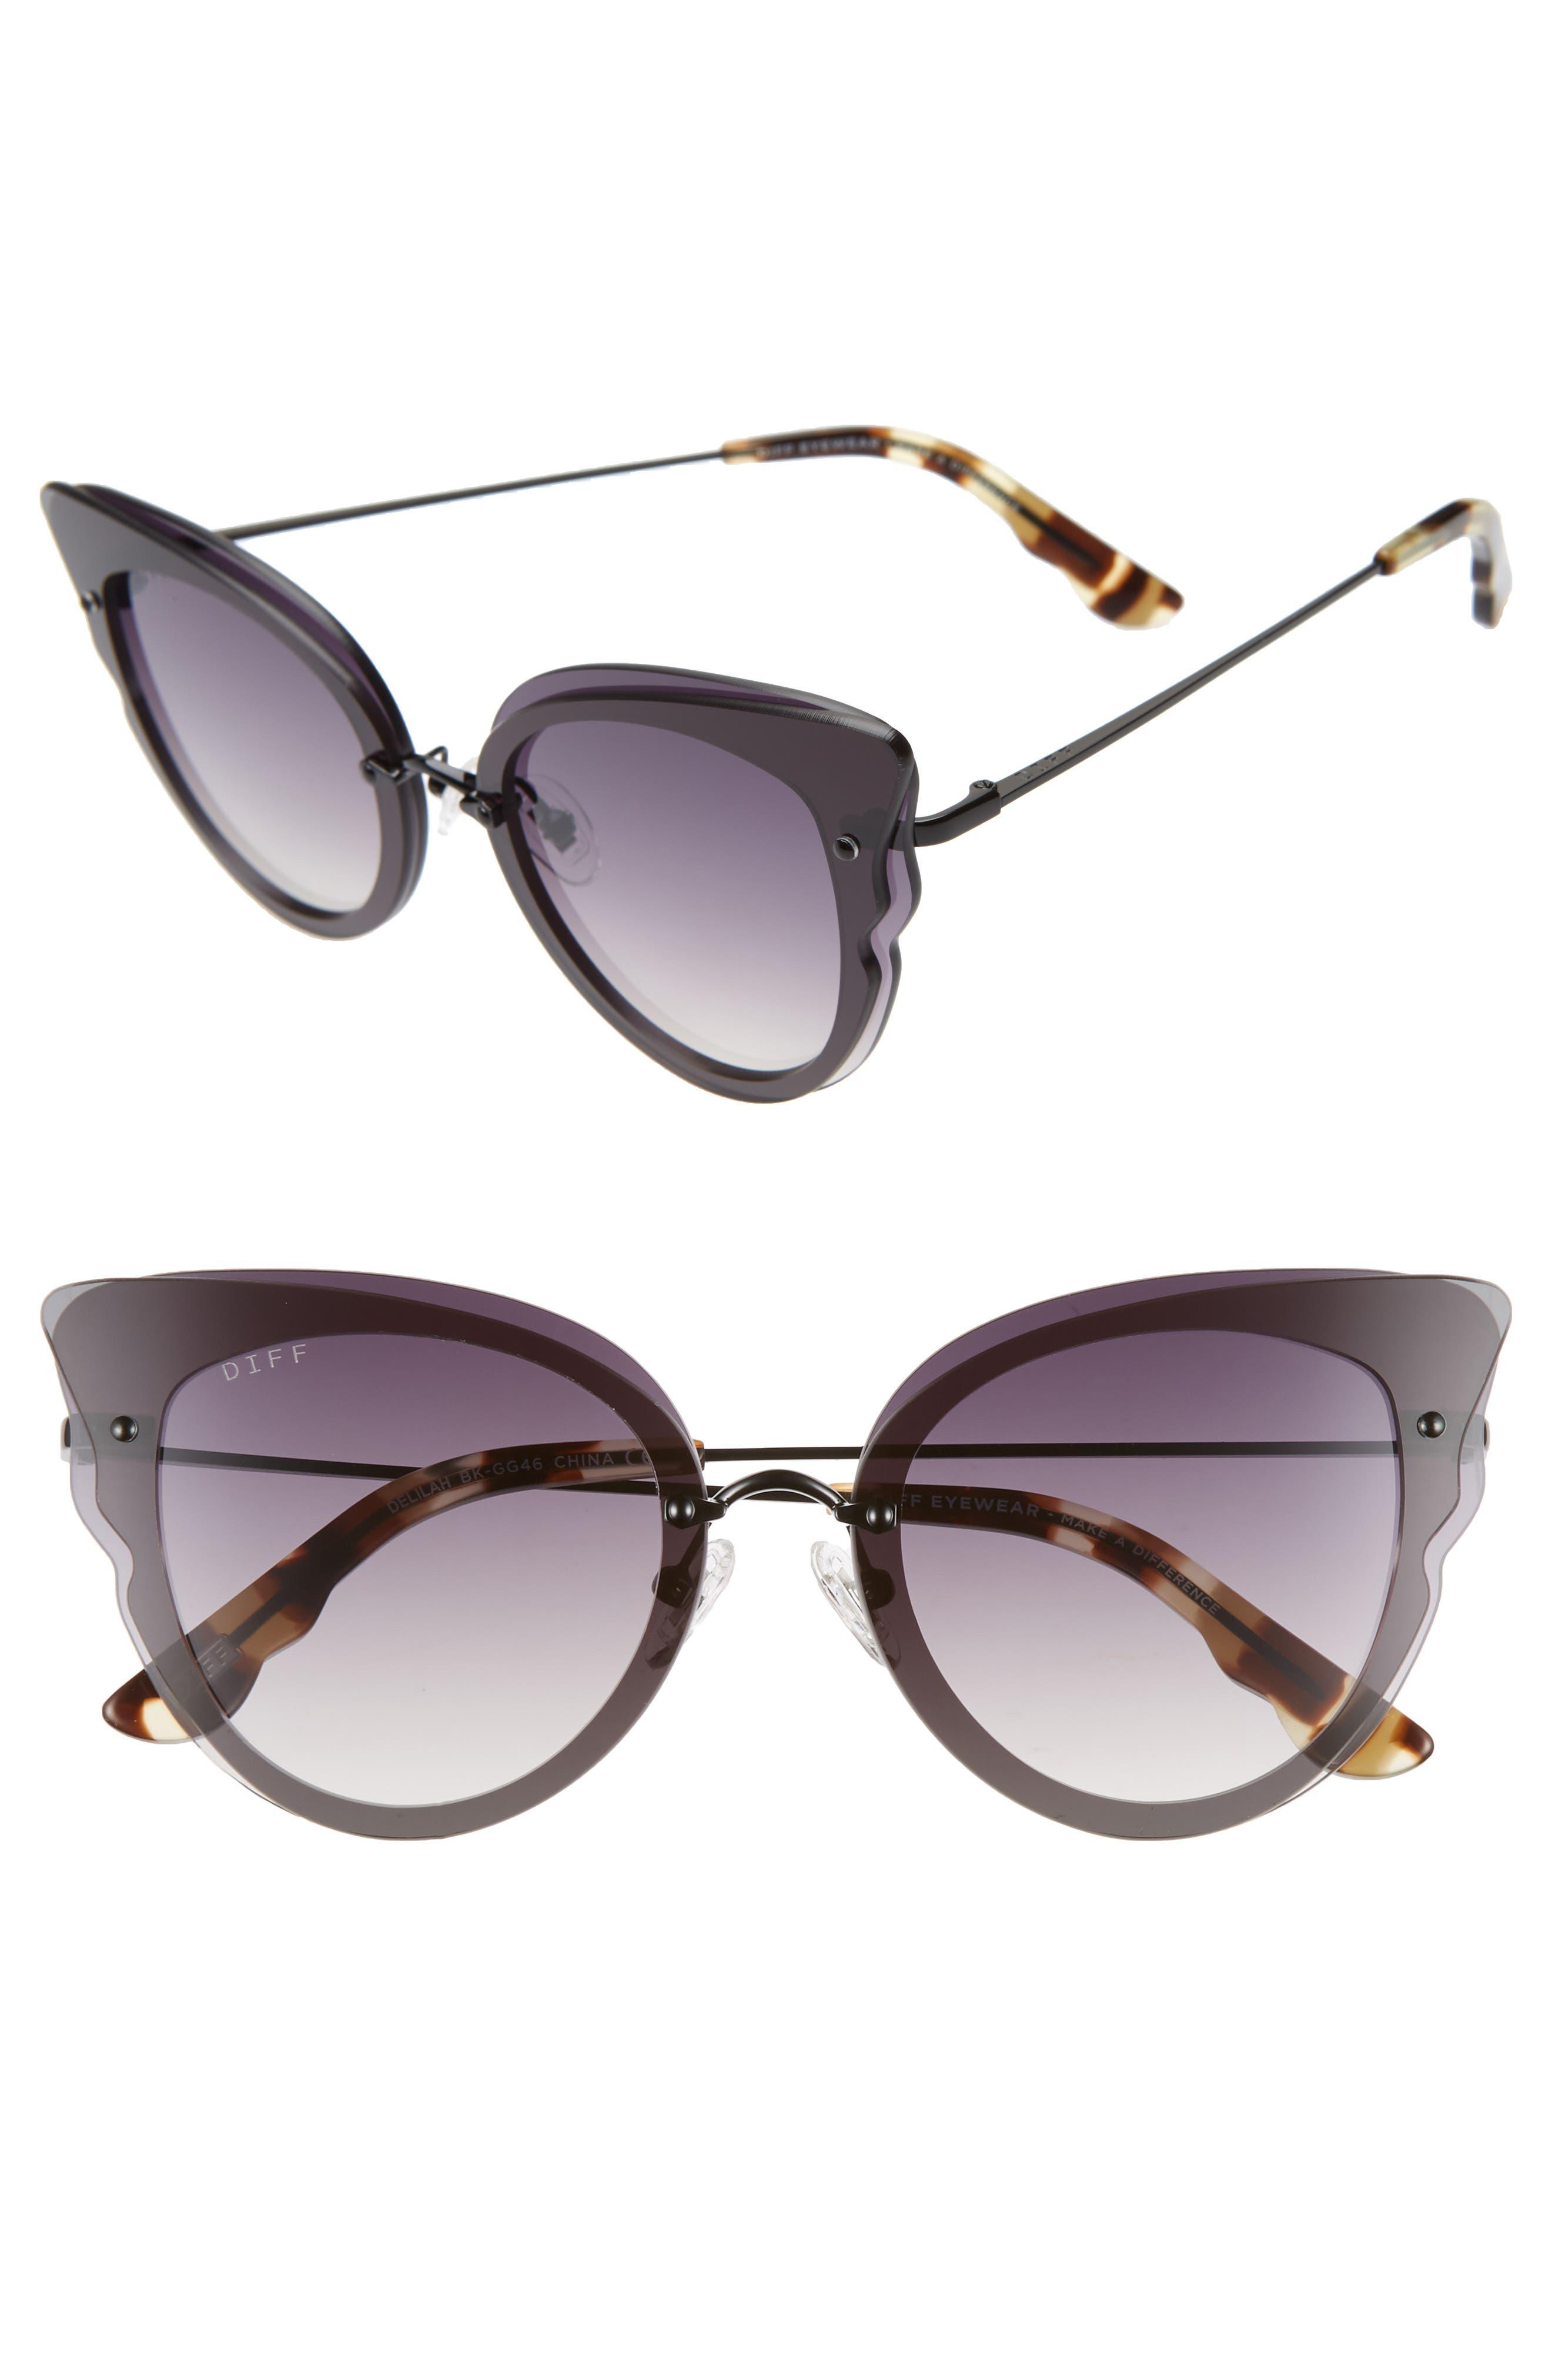 Delilah 49mm Cat Eye Sunglasses,                         Main,                         color, BLACK/ GREY